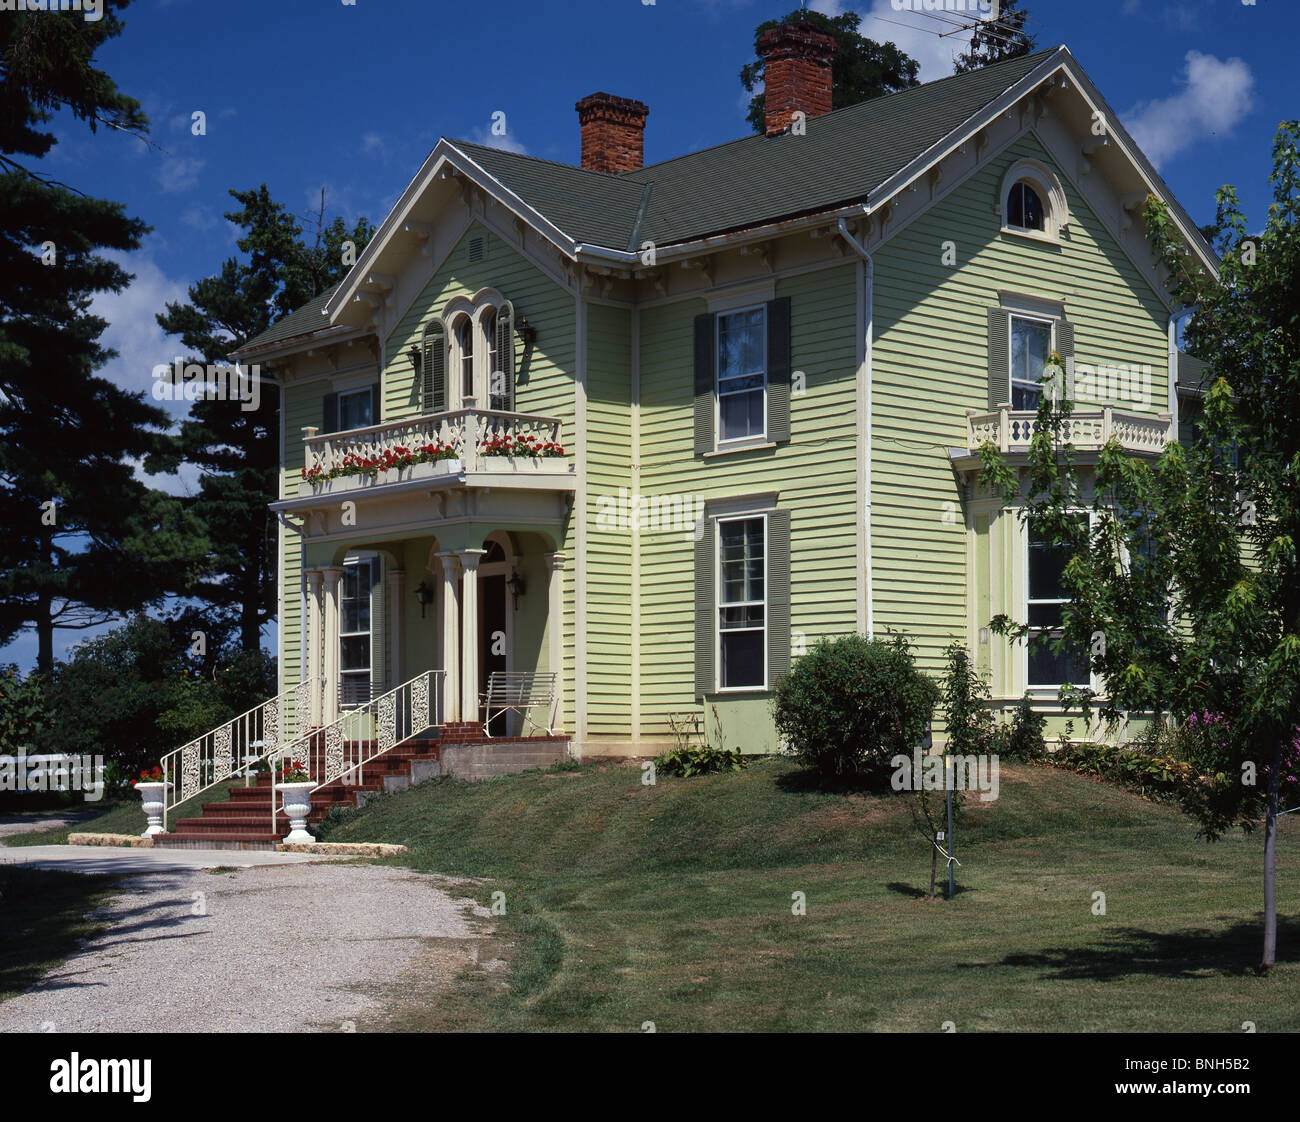 Victorian House, IL - Stock Image